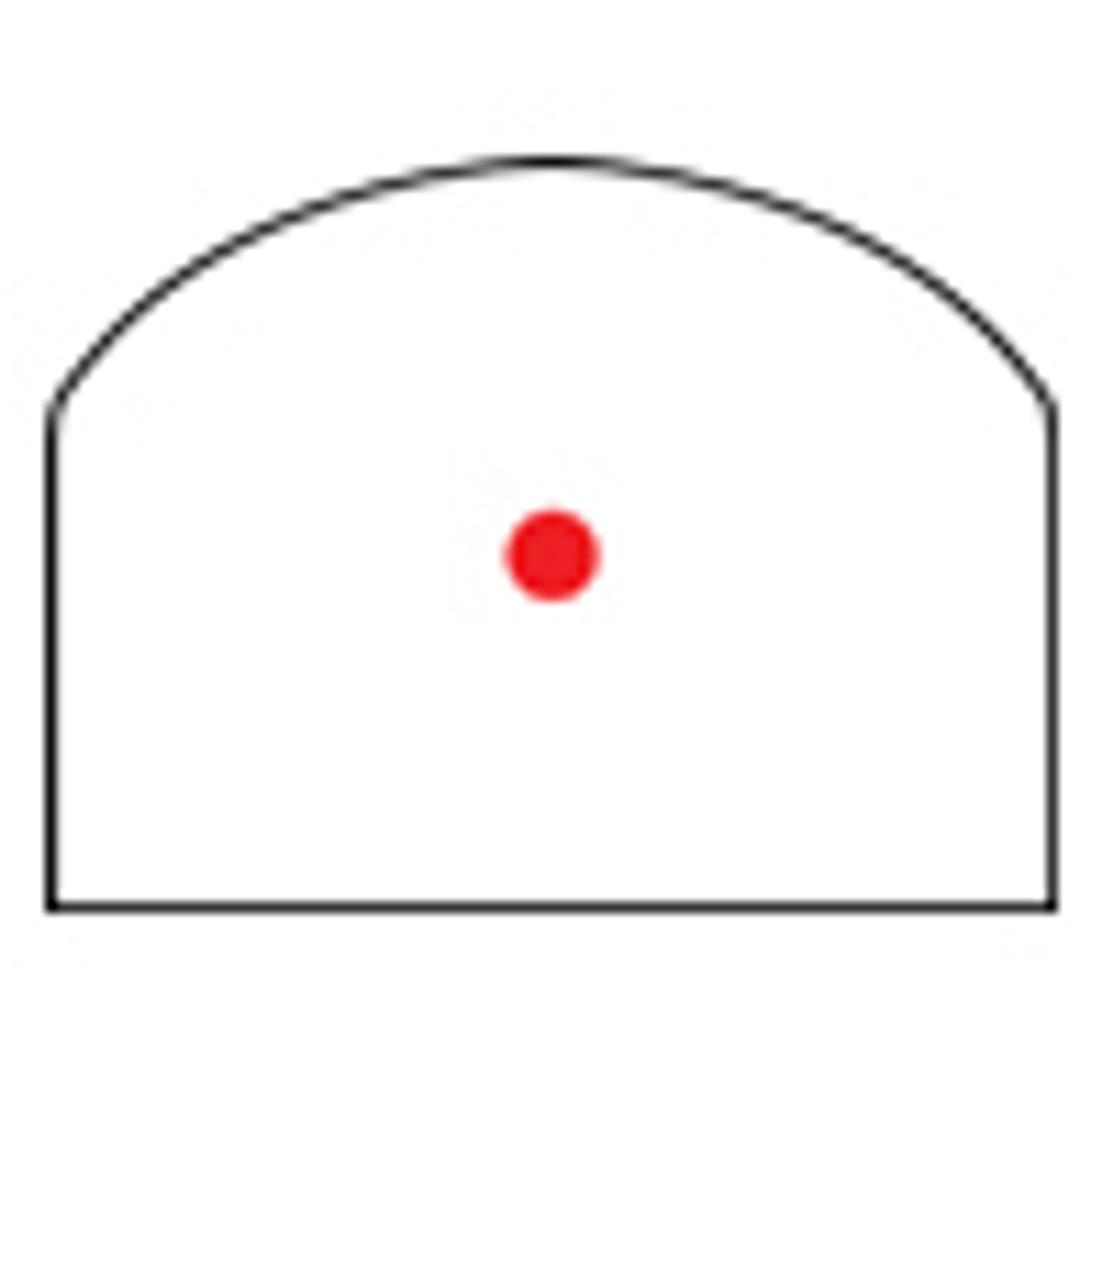 Trijicon - RMR® Type 2 LED Sight - 6.5 MOA Red Dot